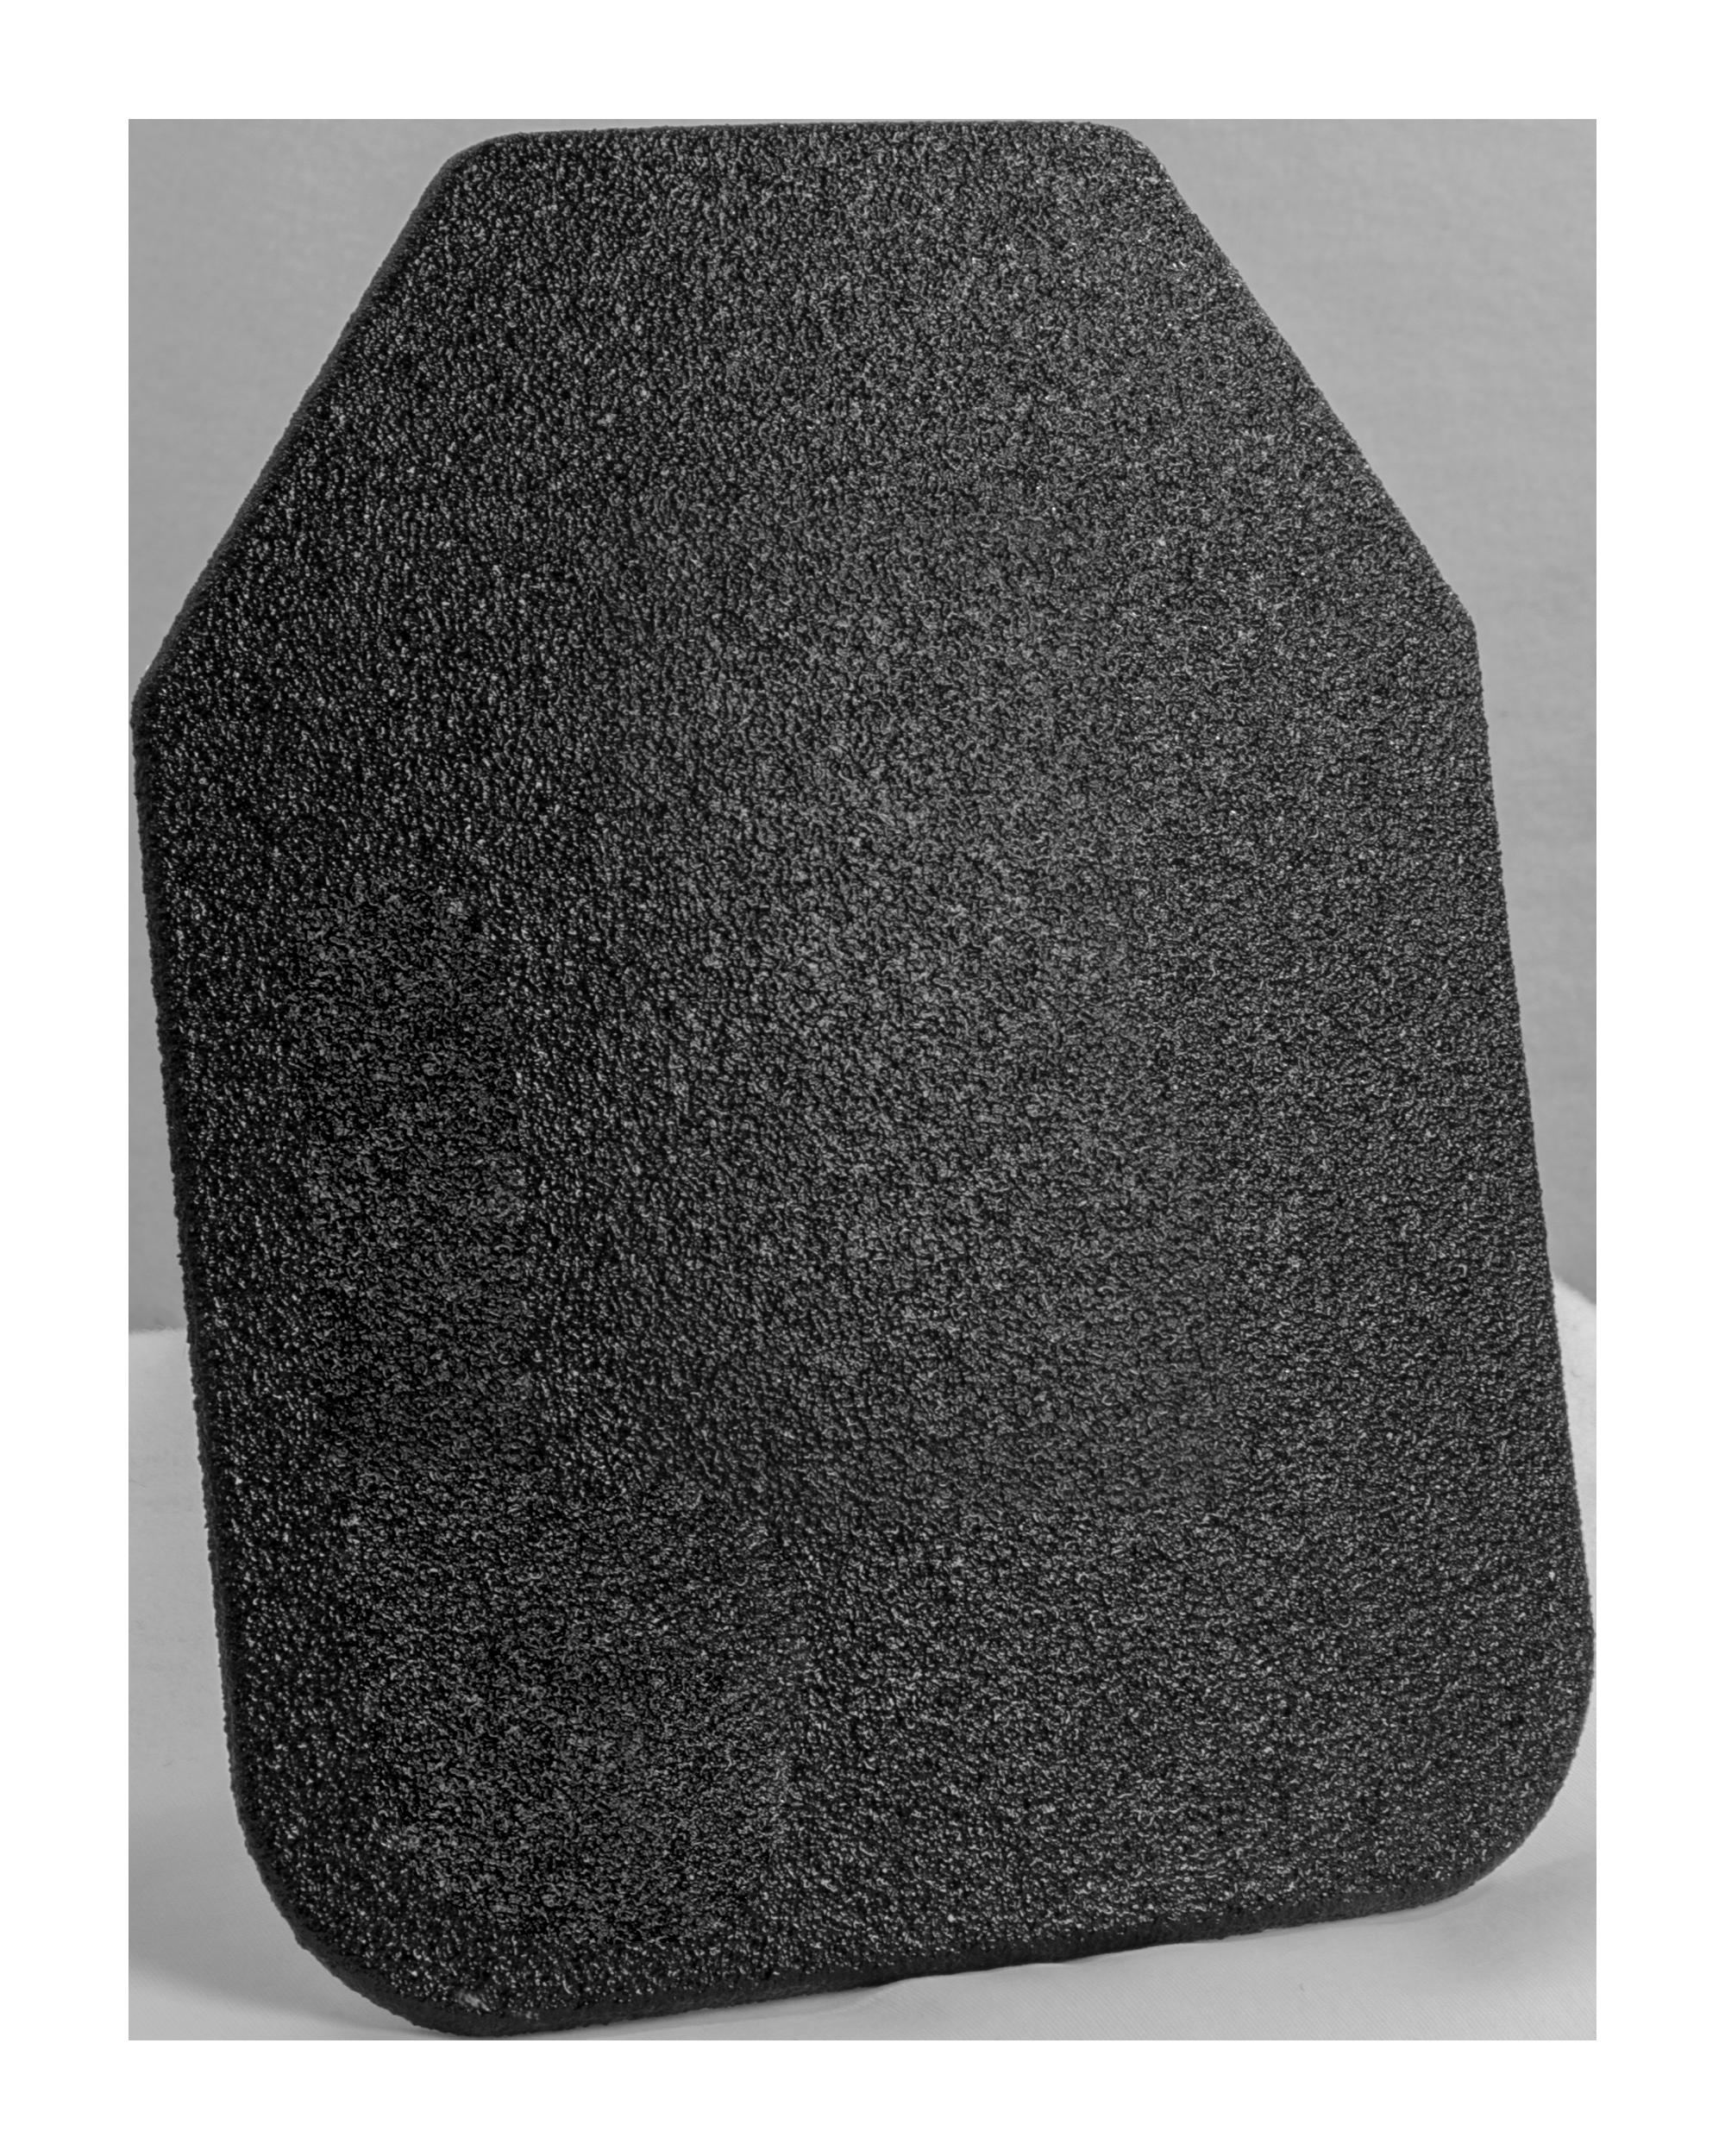 LION Body Armor Rifle Plate